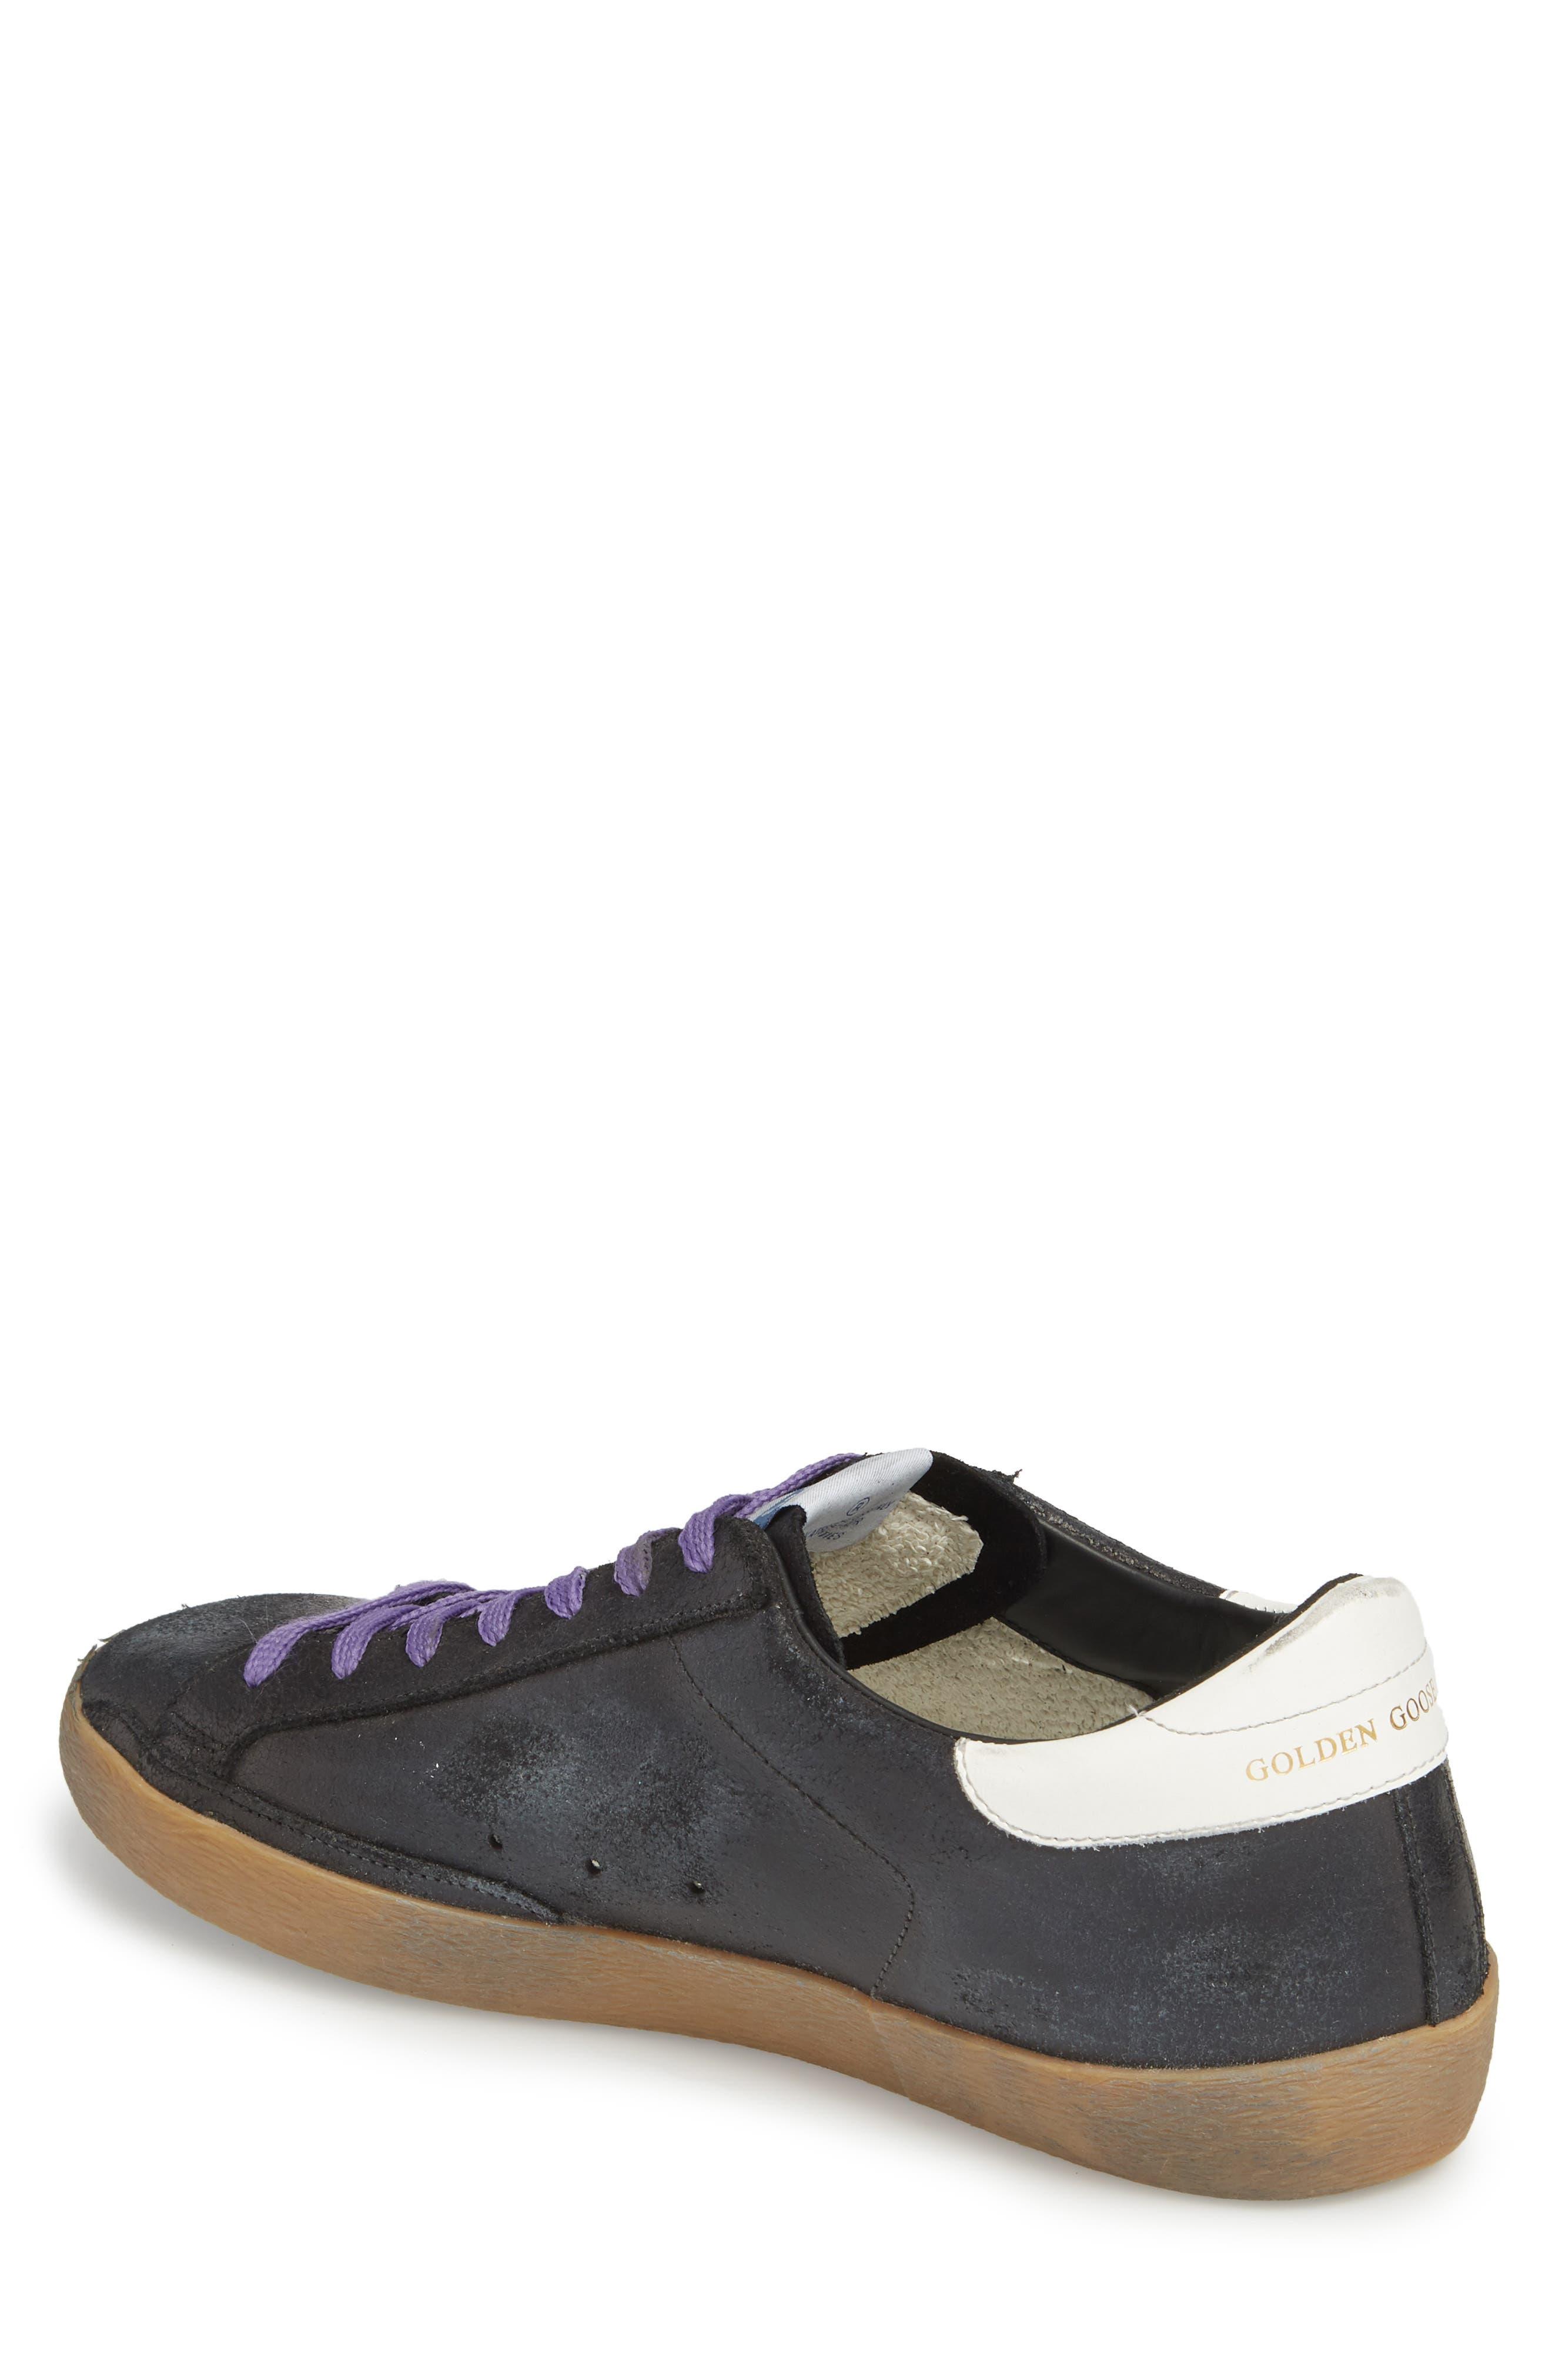 'Superstar' Sneaker,                             Alternate thumbnail 2, color,                             BLACK CRACK-BLUE STAR